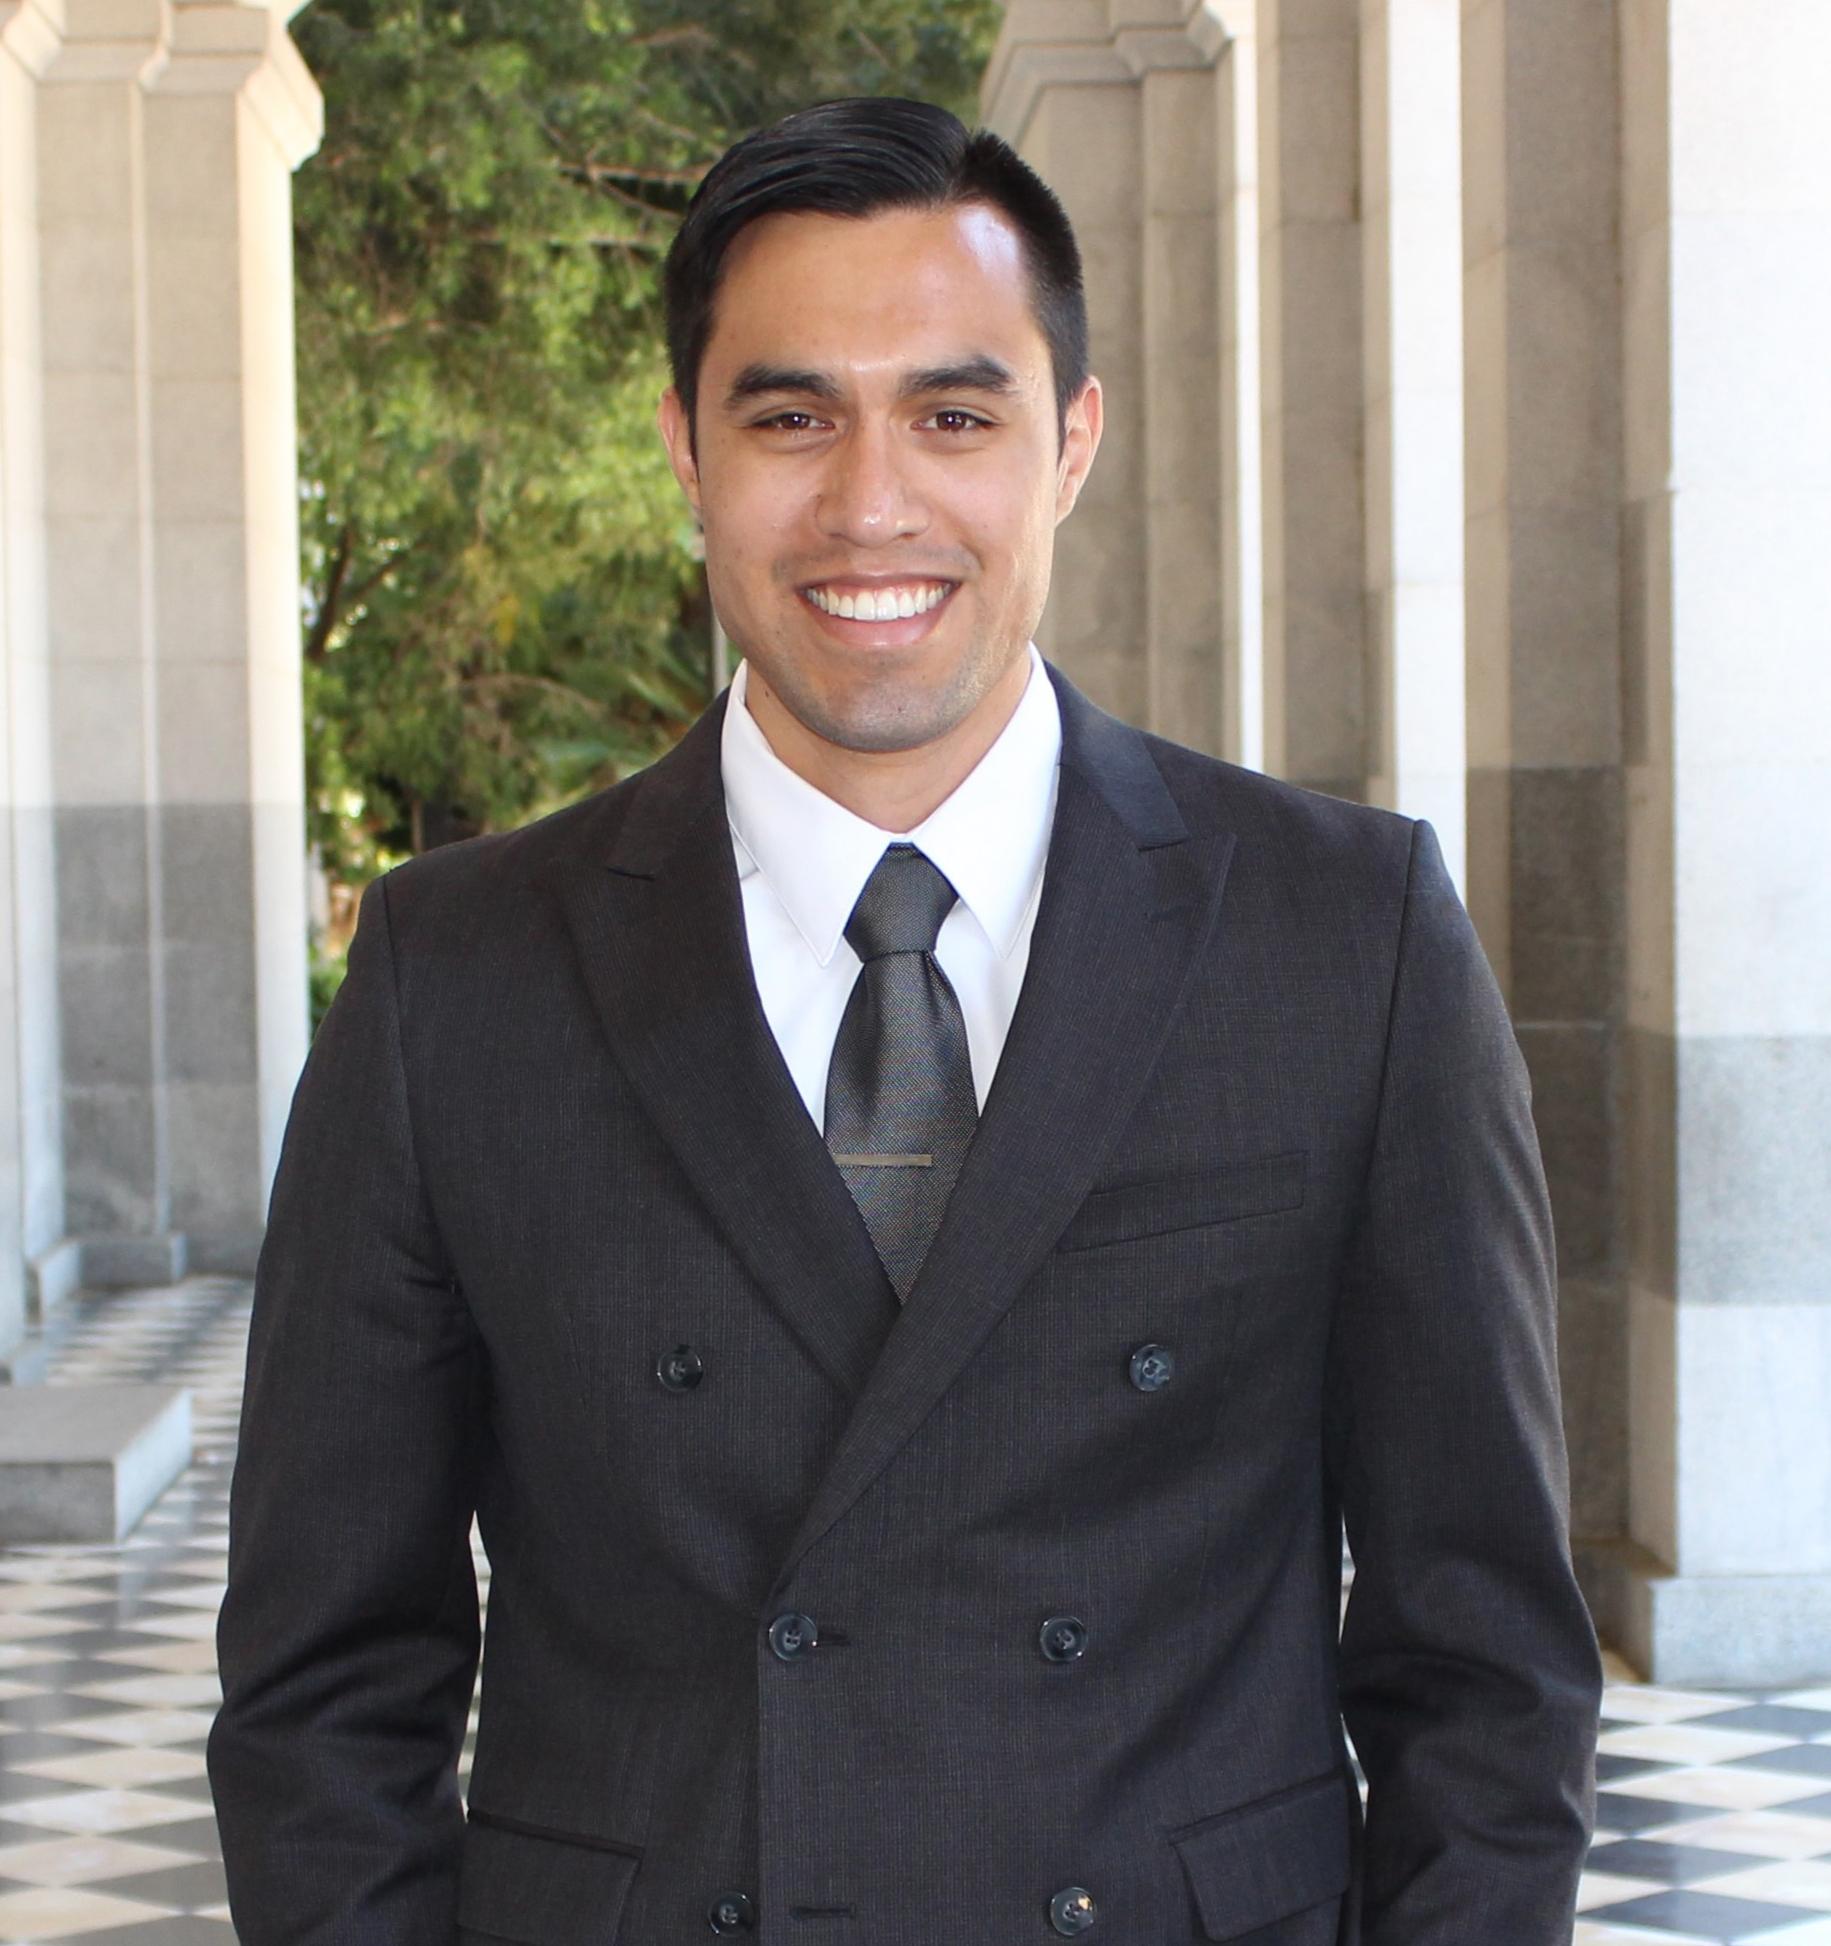 Jose_Alvarado.JPG